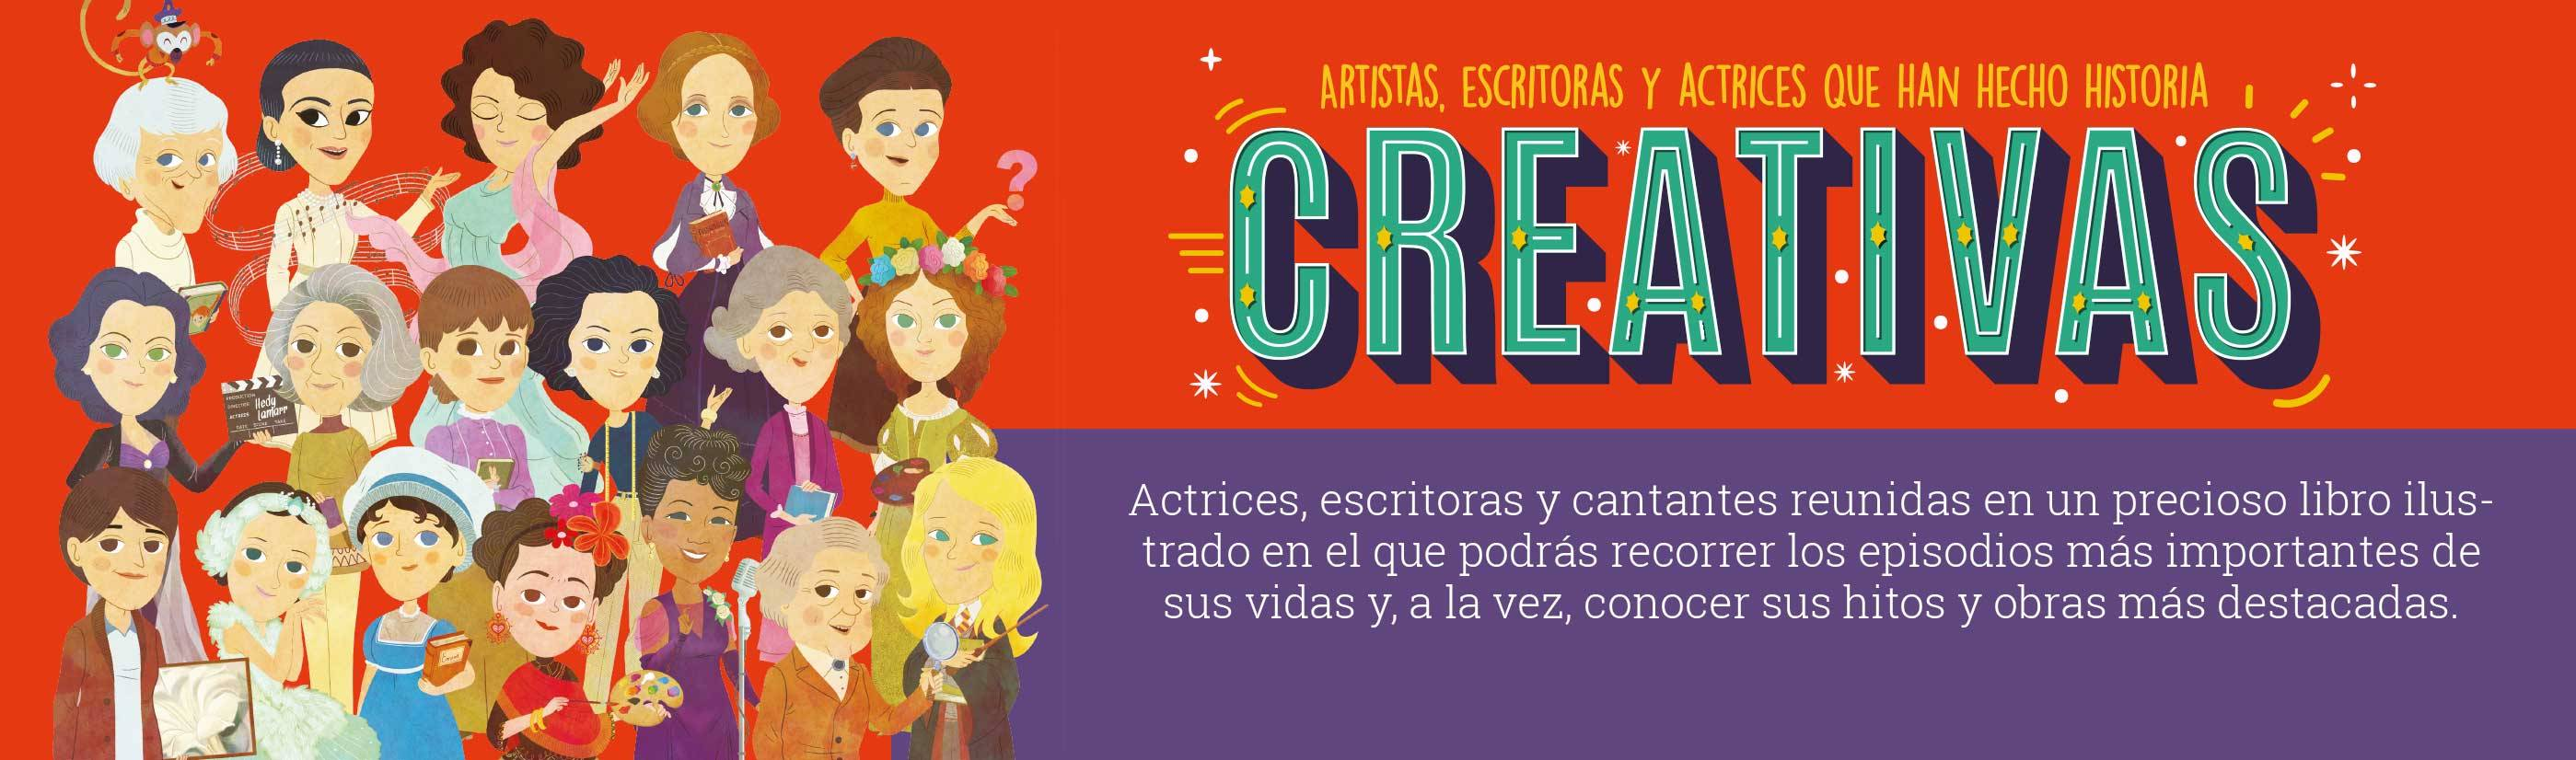 Creativas